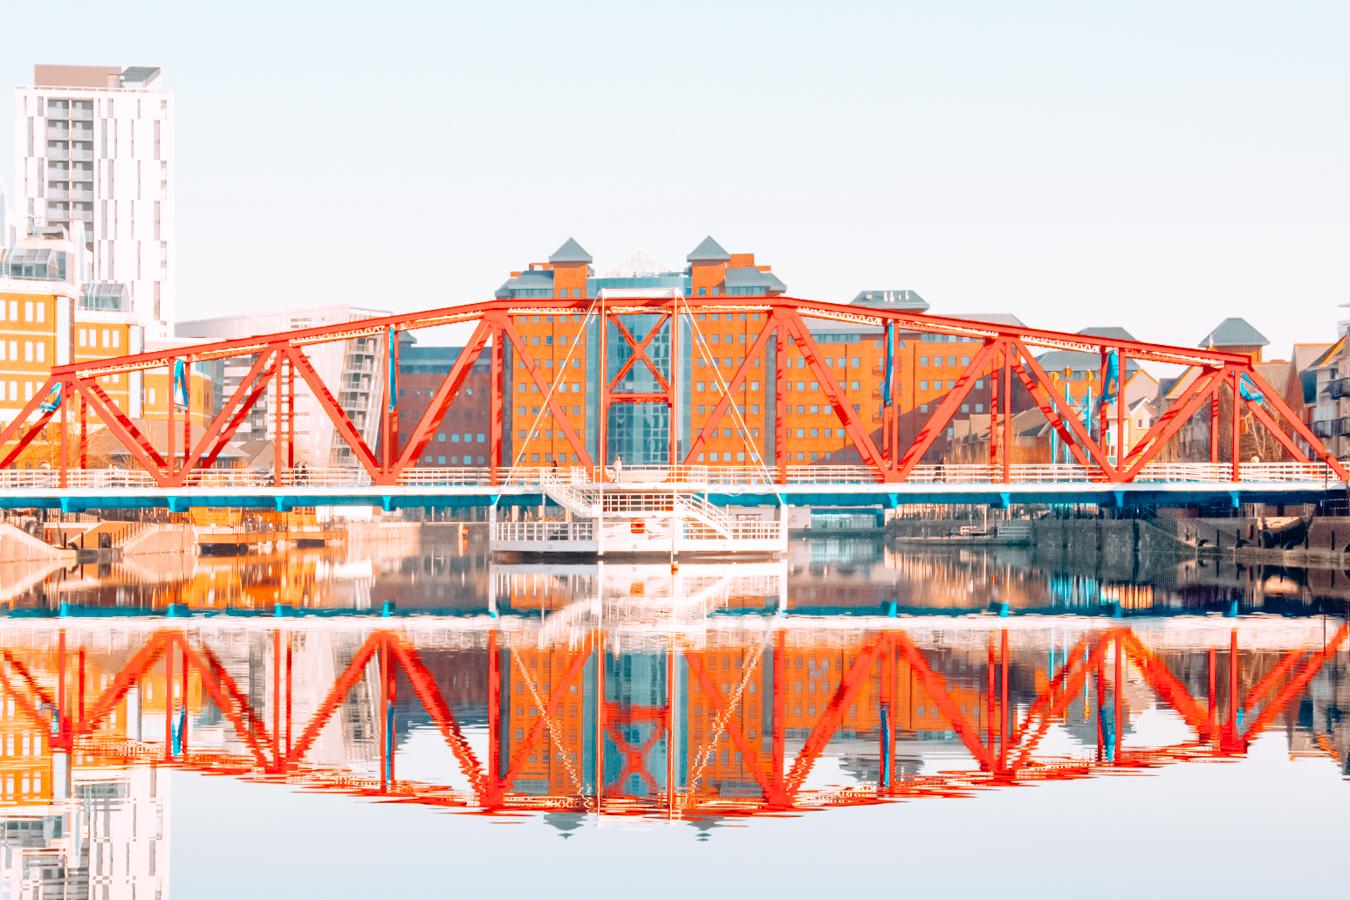 Red bridge in Manchester